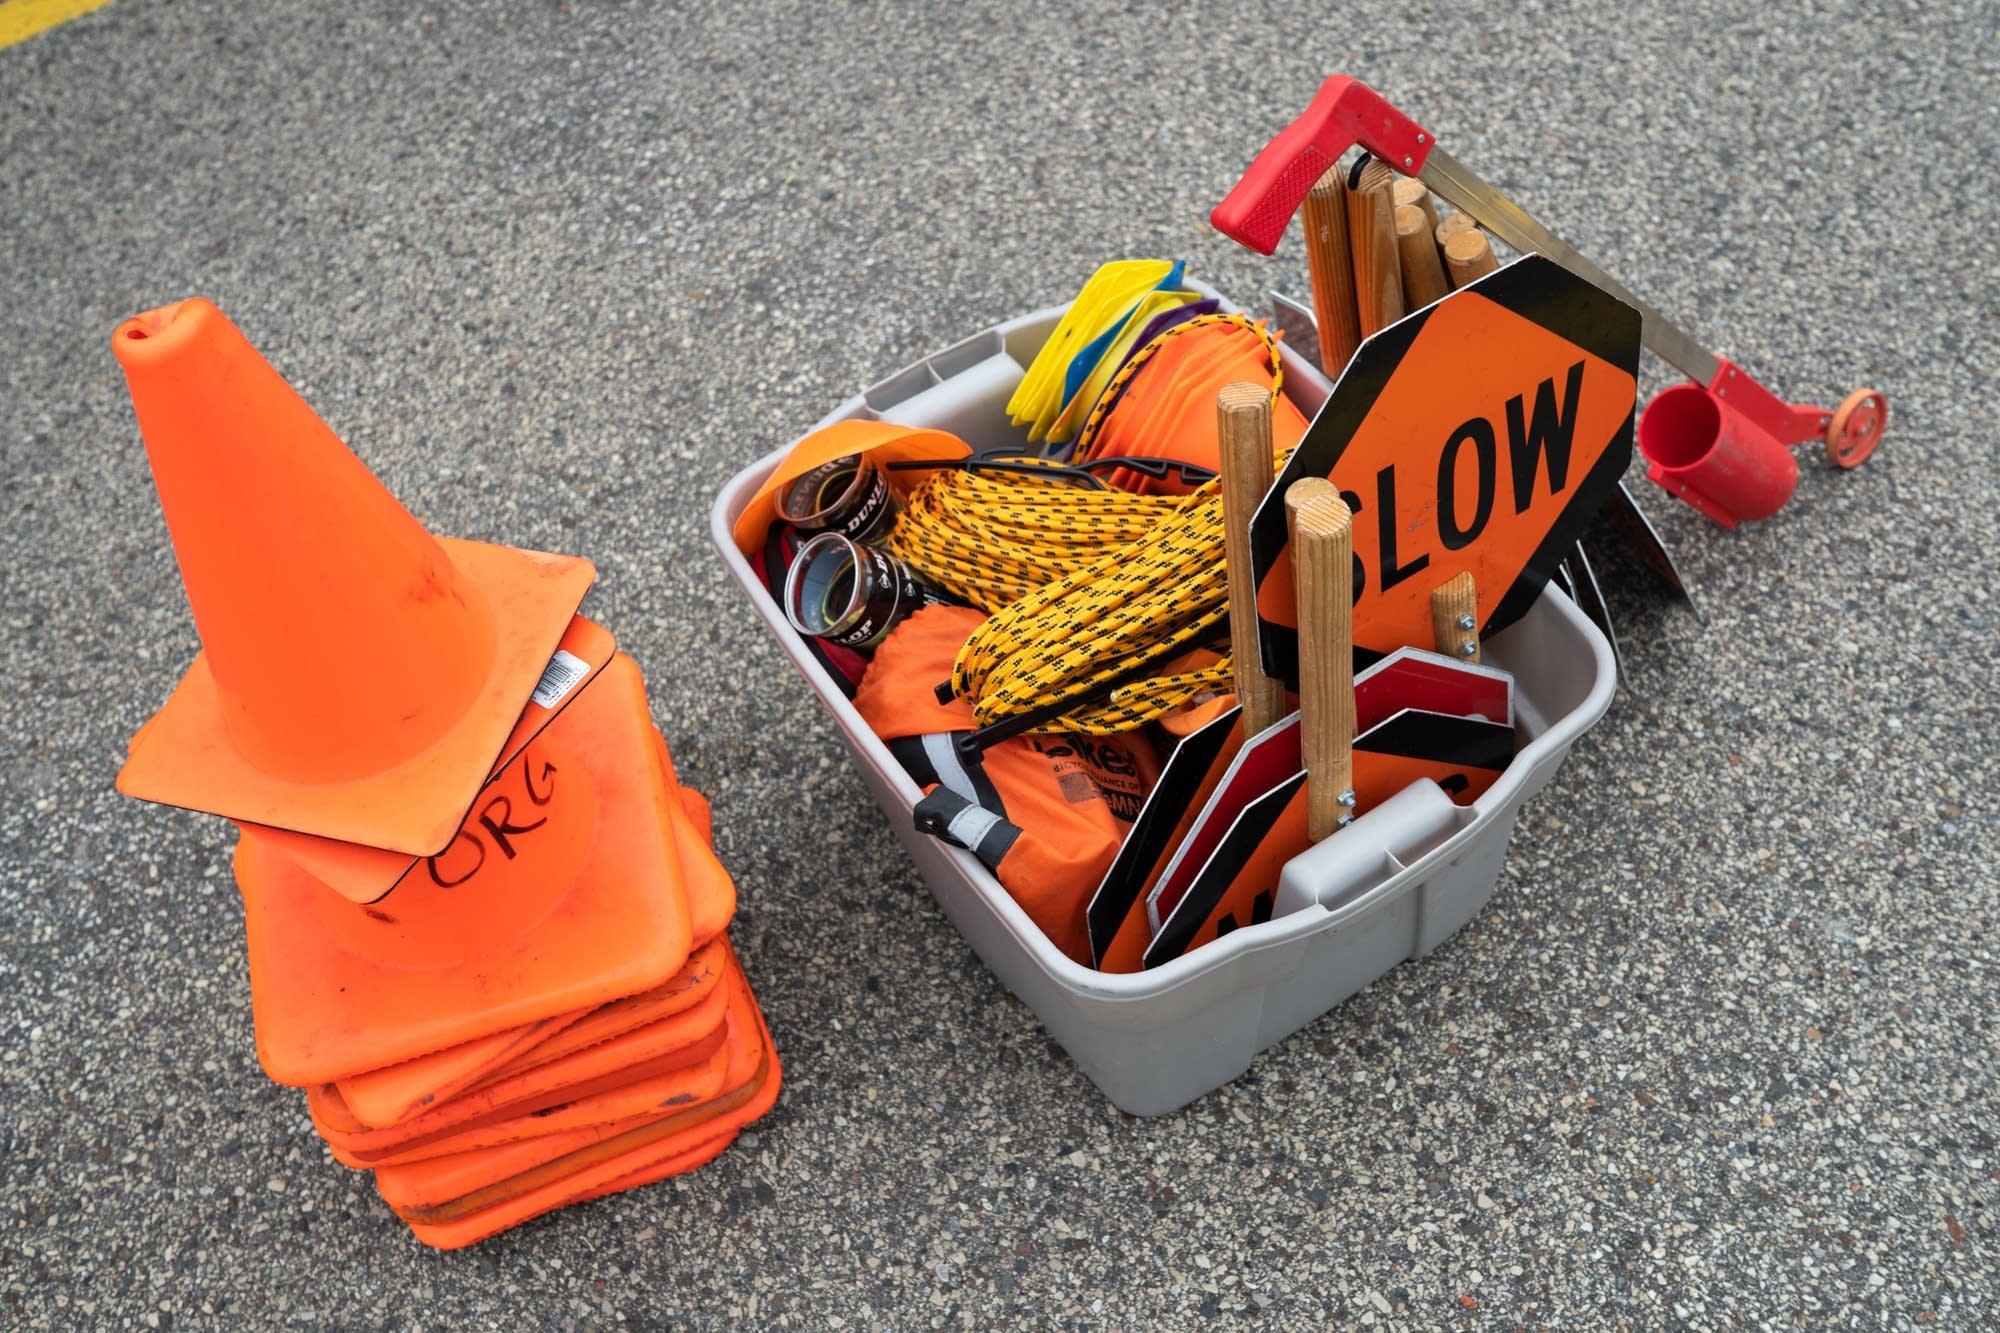 Materials used to run a Walk! Bike! Fun! training sit in a bin.